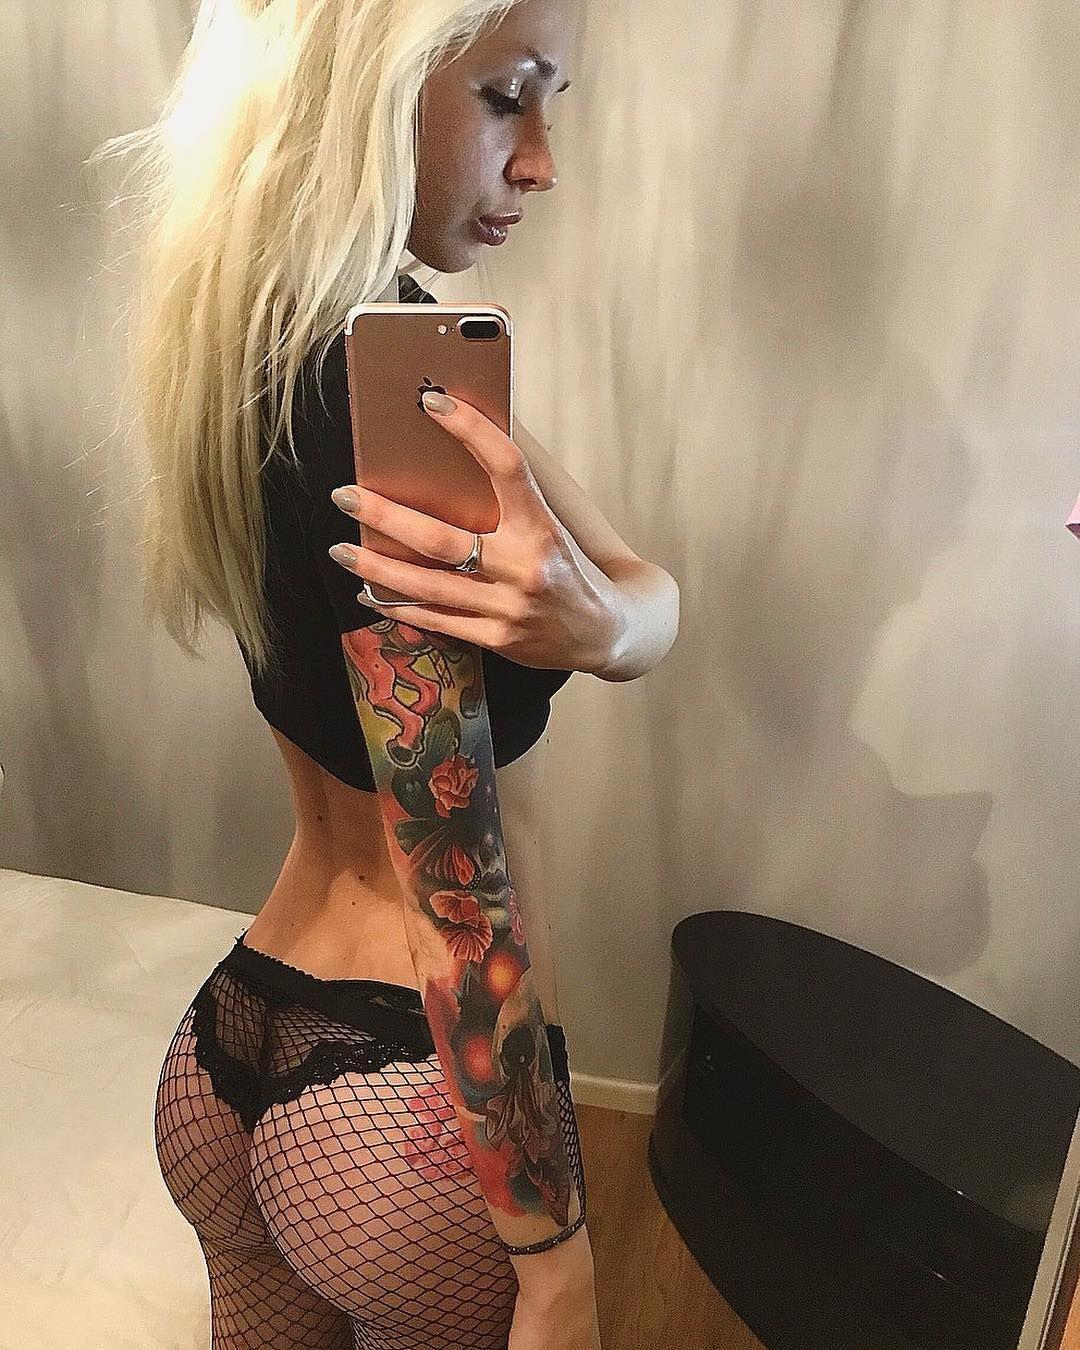 Missttkiss nude (33 photos), pics Tits, Instagram, braless 2018